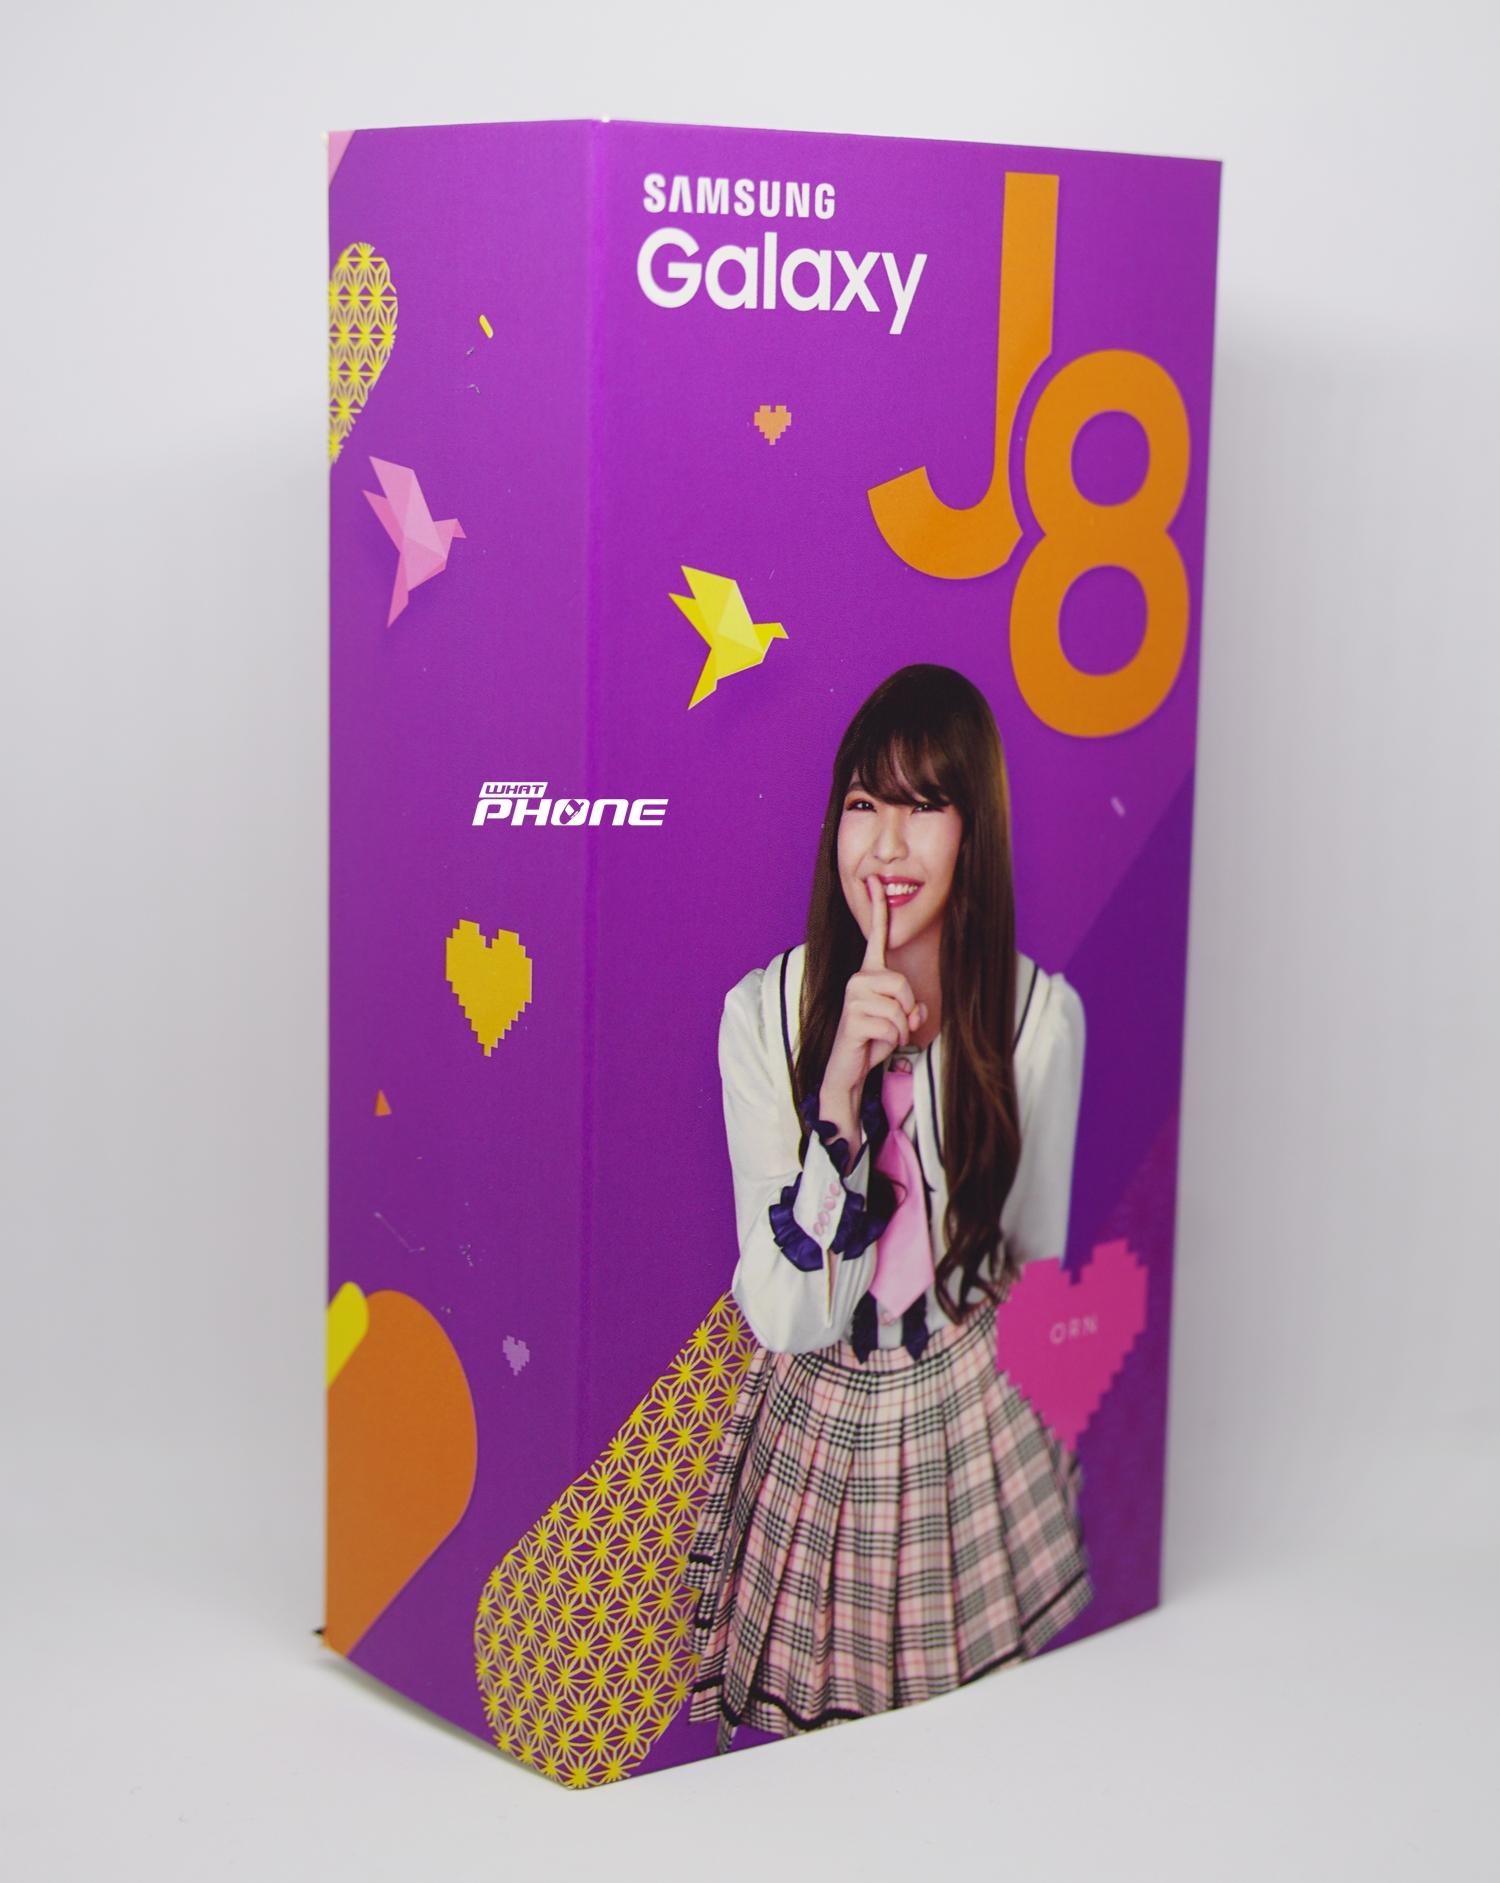 Samsung Galaxy J8 x BNK48 Limited Edition BOXSET Unboxing (32)